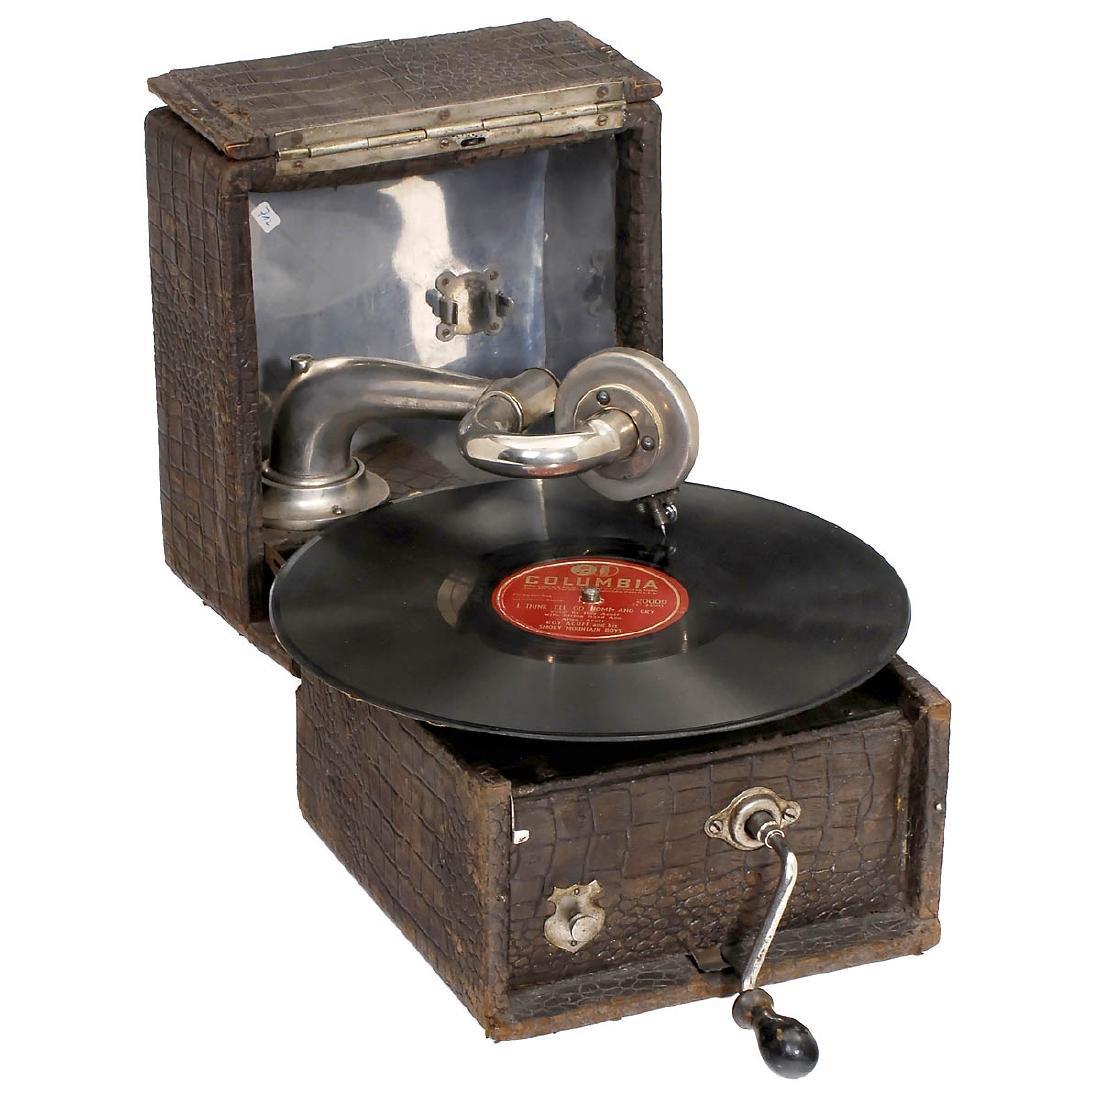 English Portable Gramophone of Unusual Construction, c.